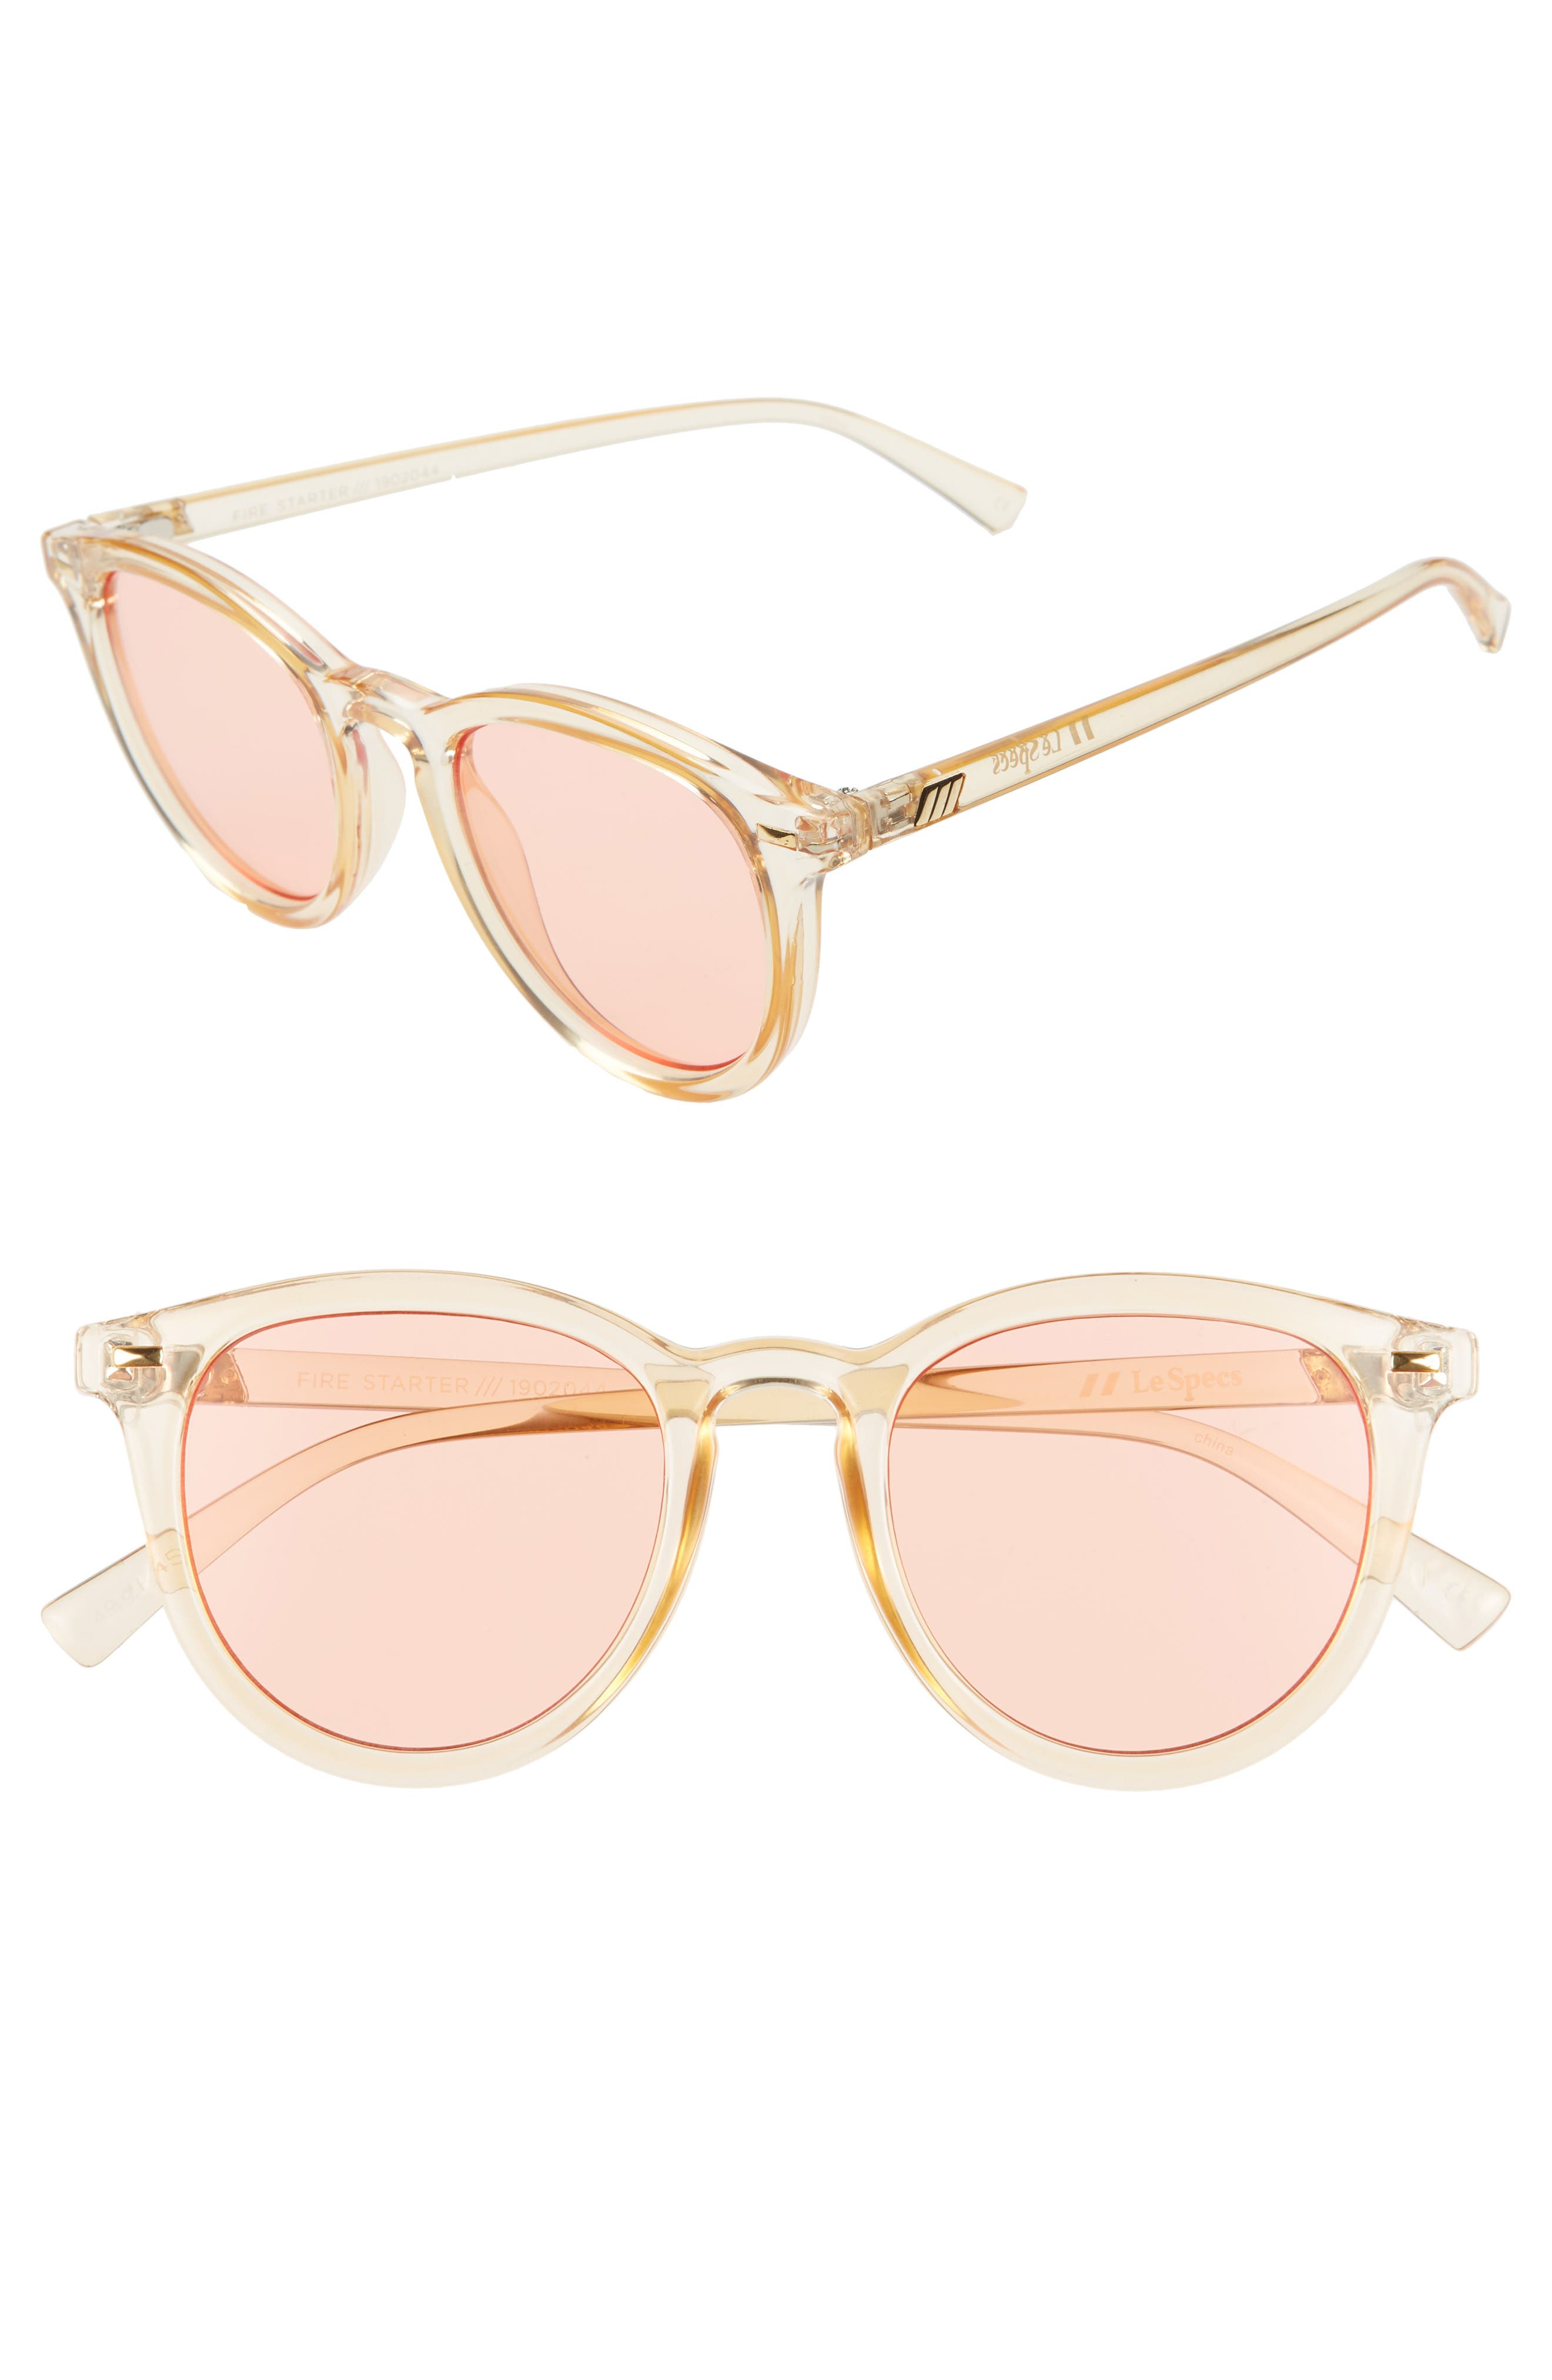 Le Specs Fire Starter 4m Round Sunglasses - Blonde/ Coral